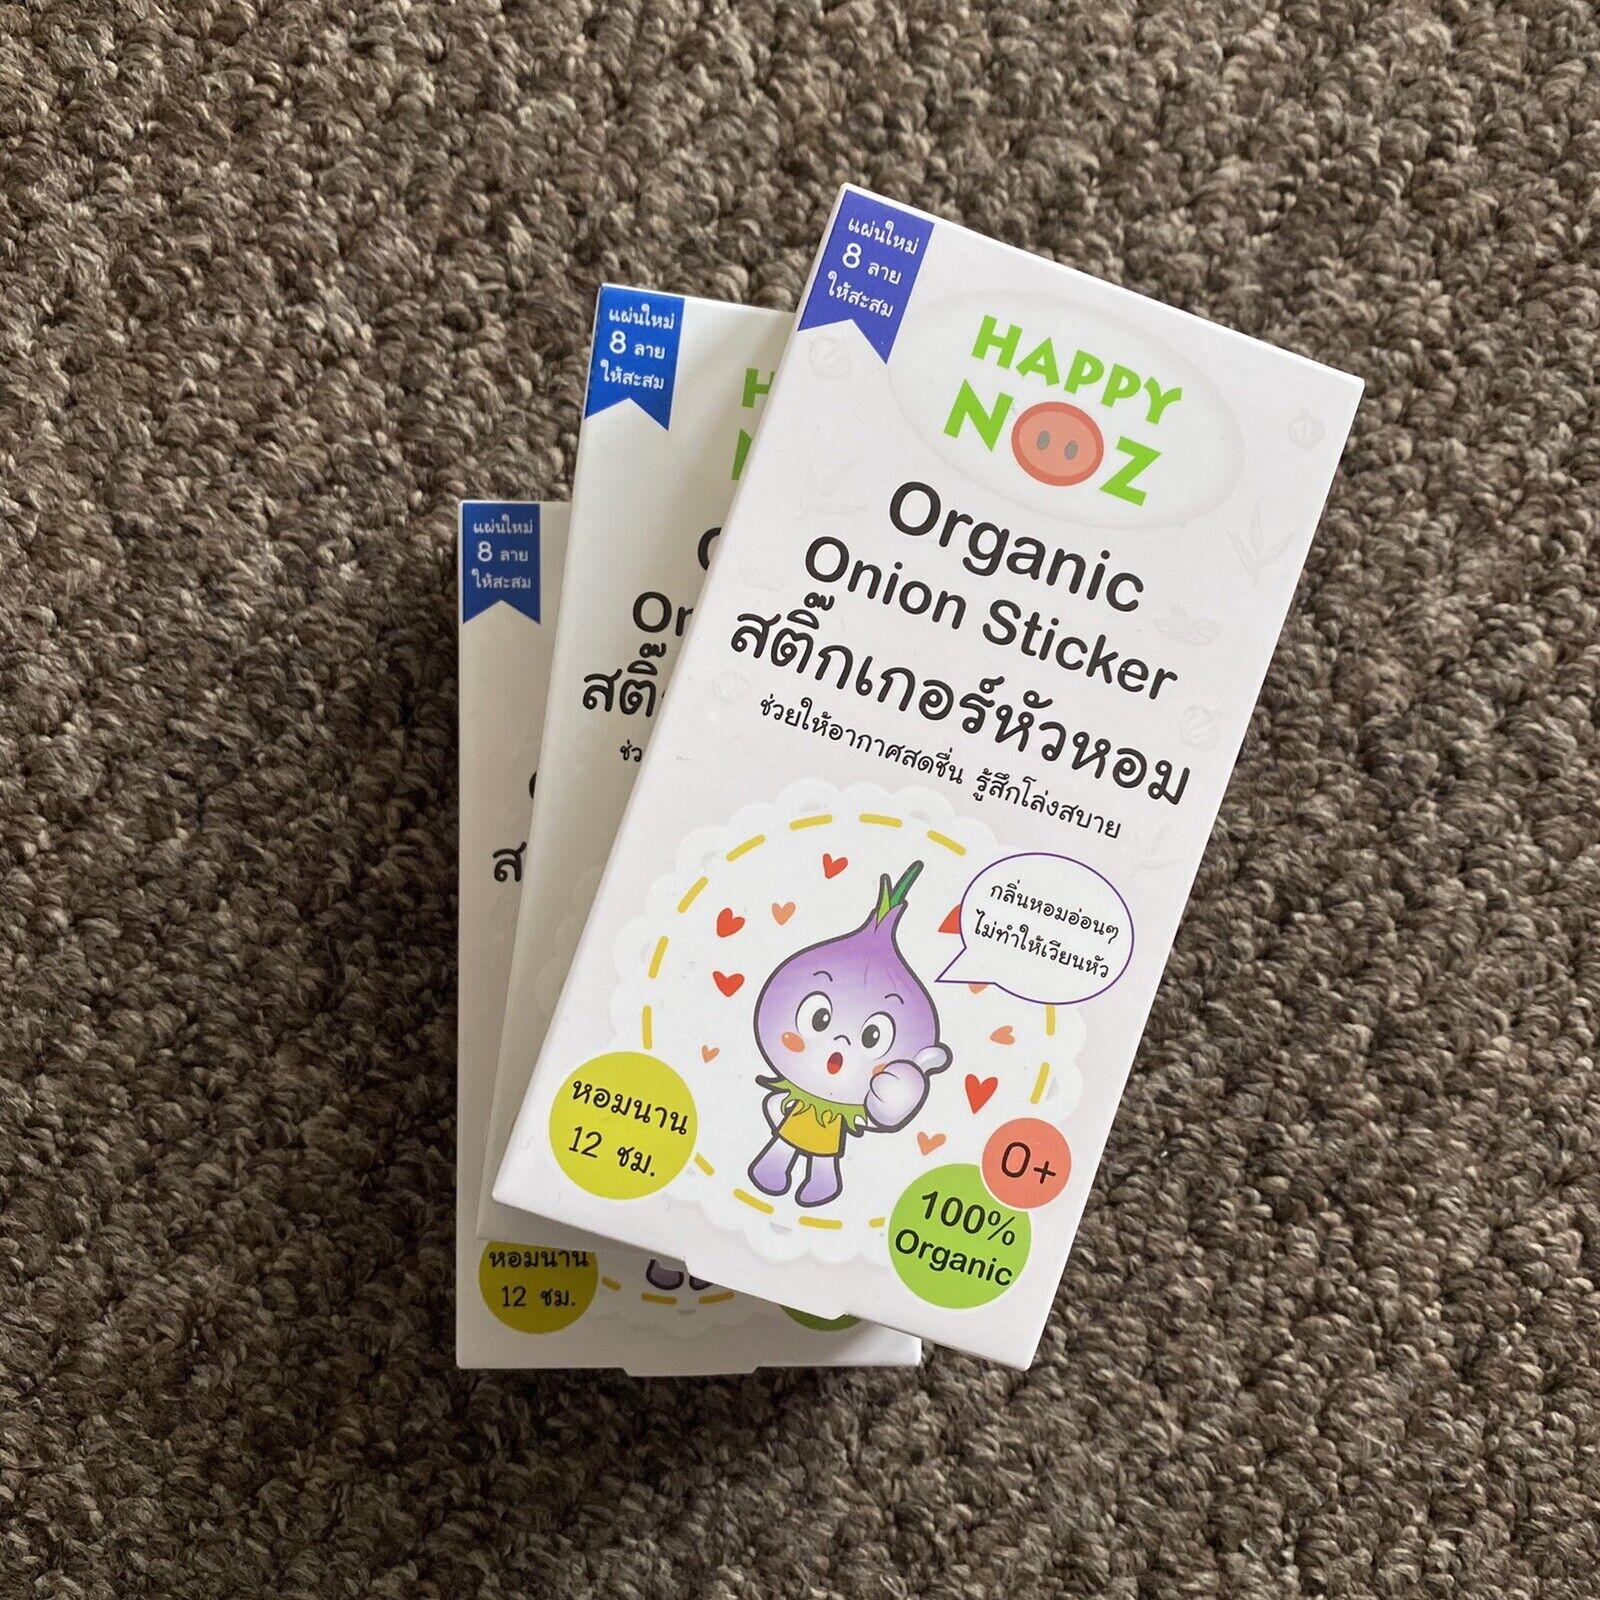 Organic onion sticker